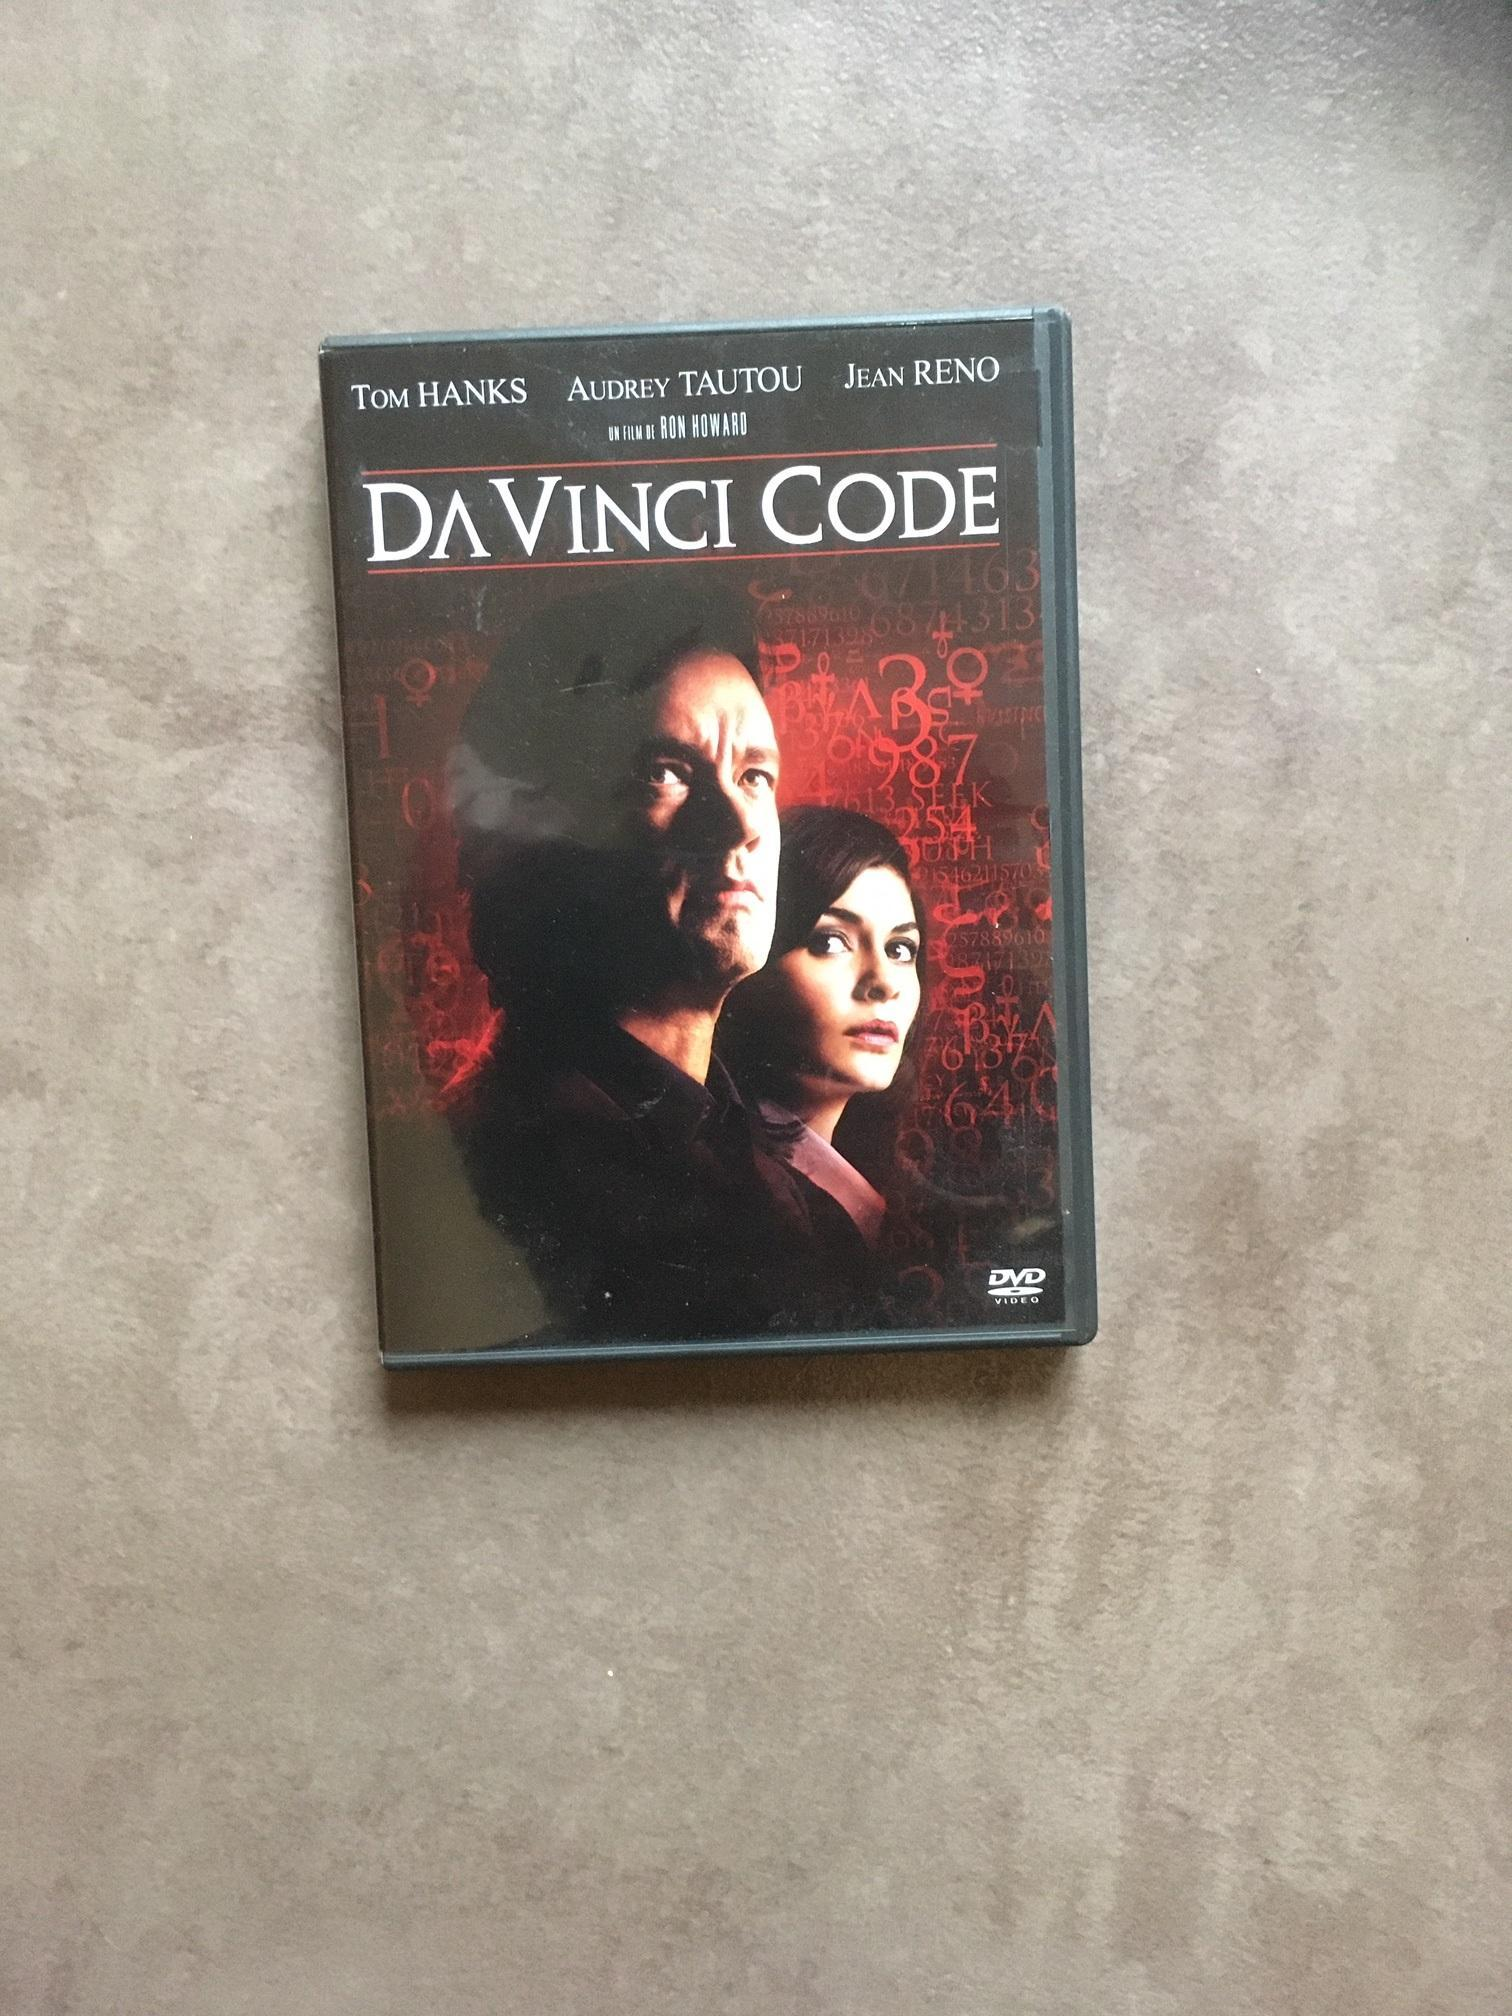 troc de troc dvd da vinci code image 0